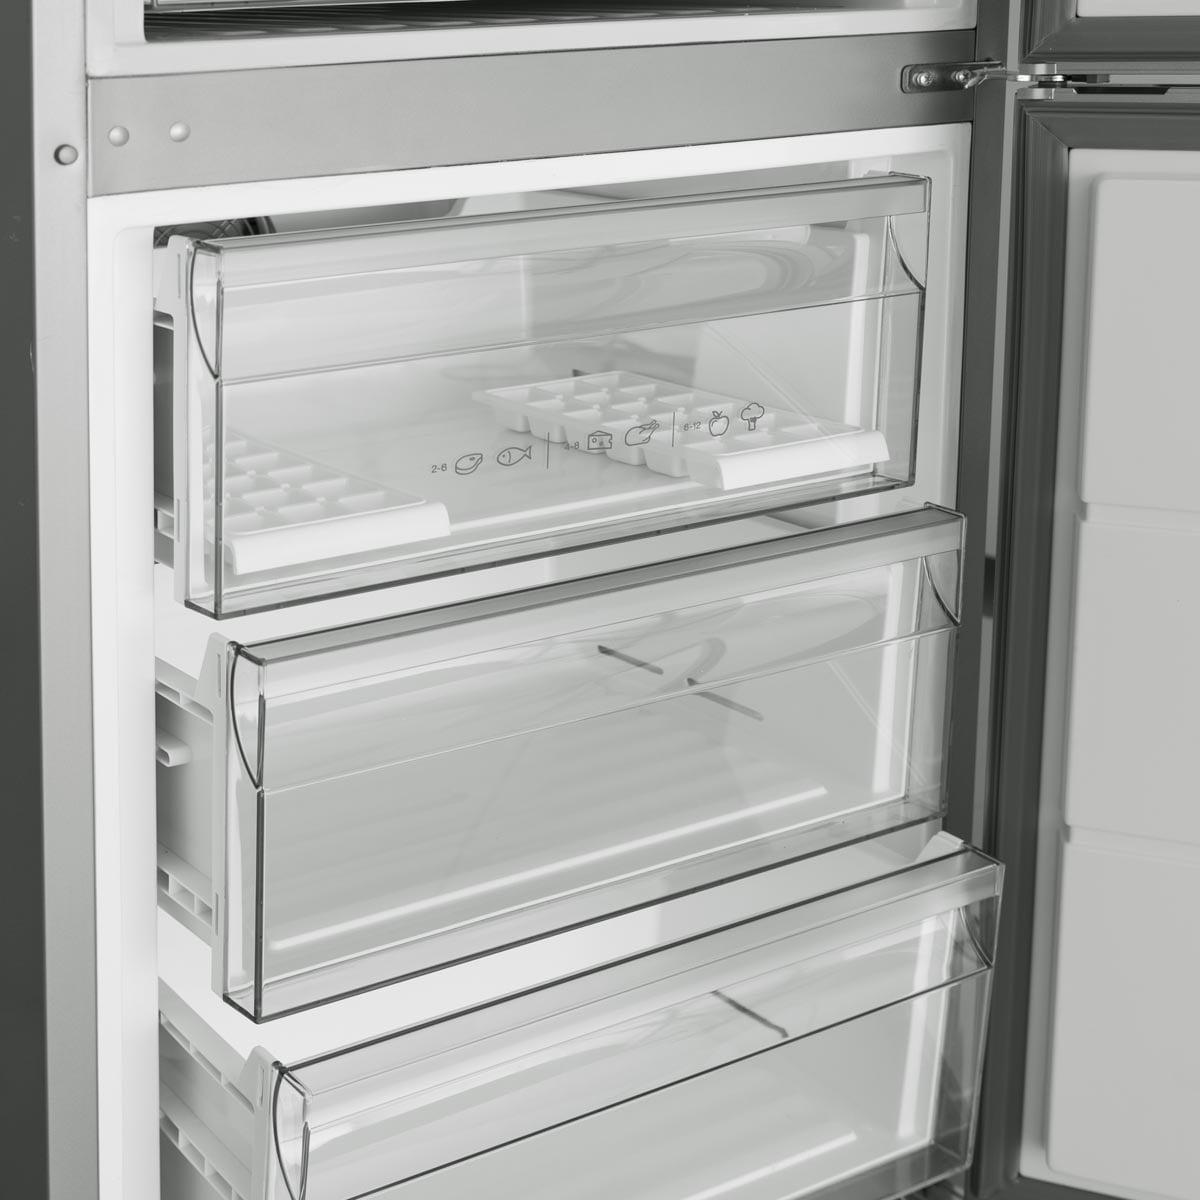 Kombinovani frižider 324 l (208+22+94) - Sharp SJ-BA10IMXI2 police